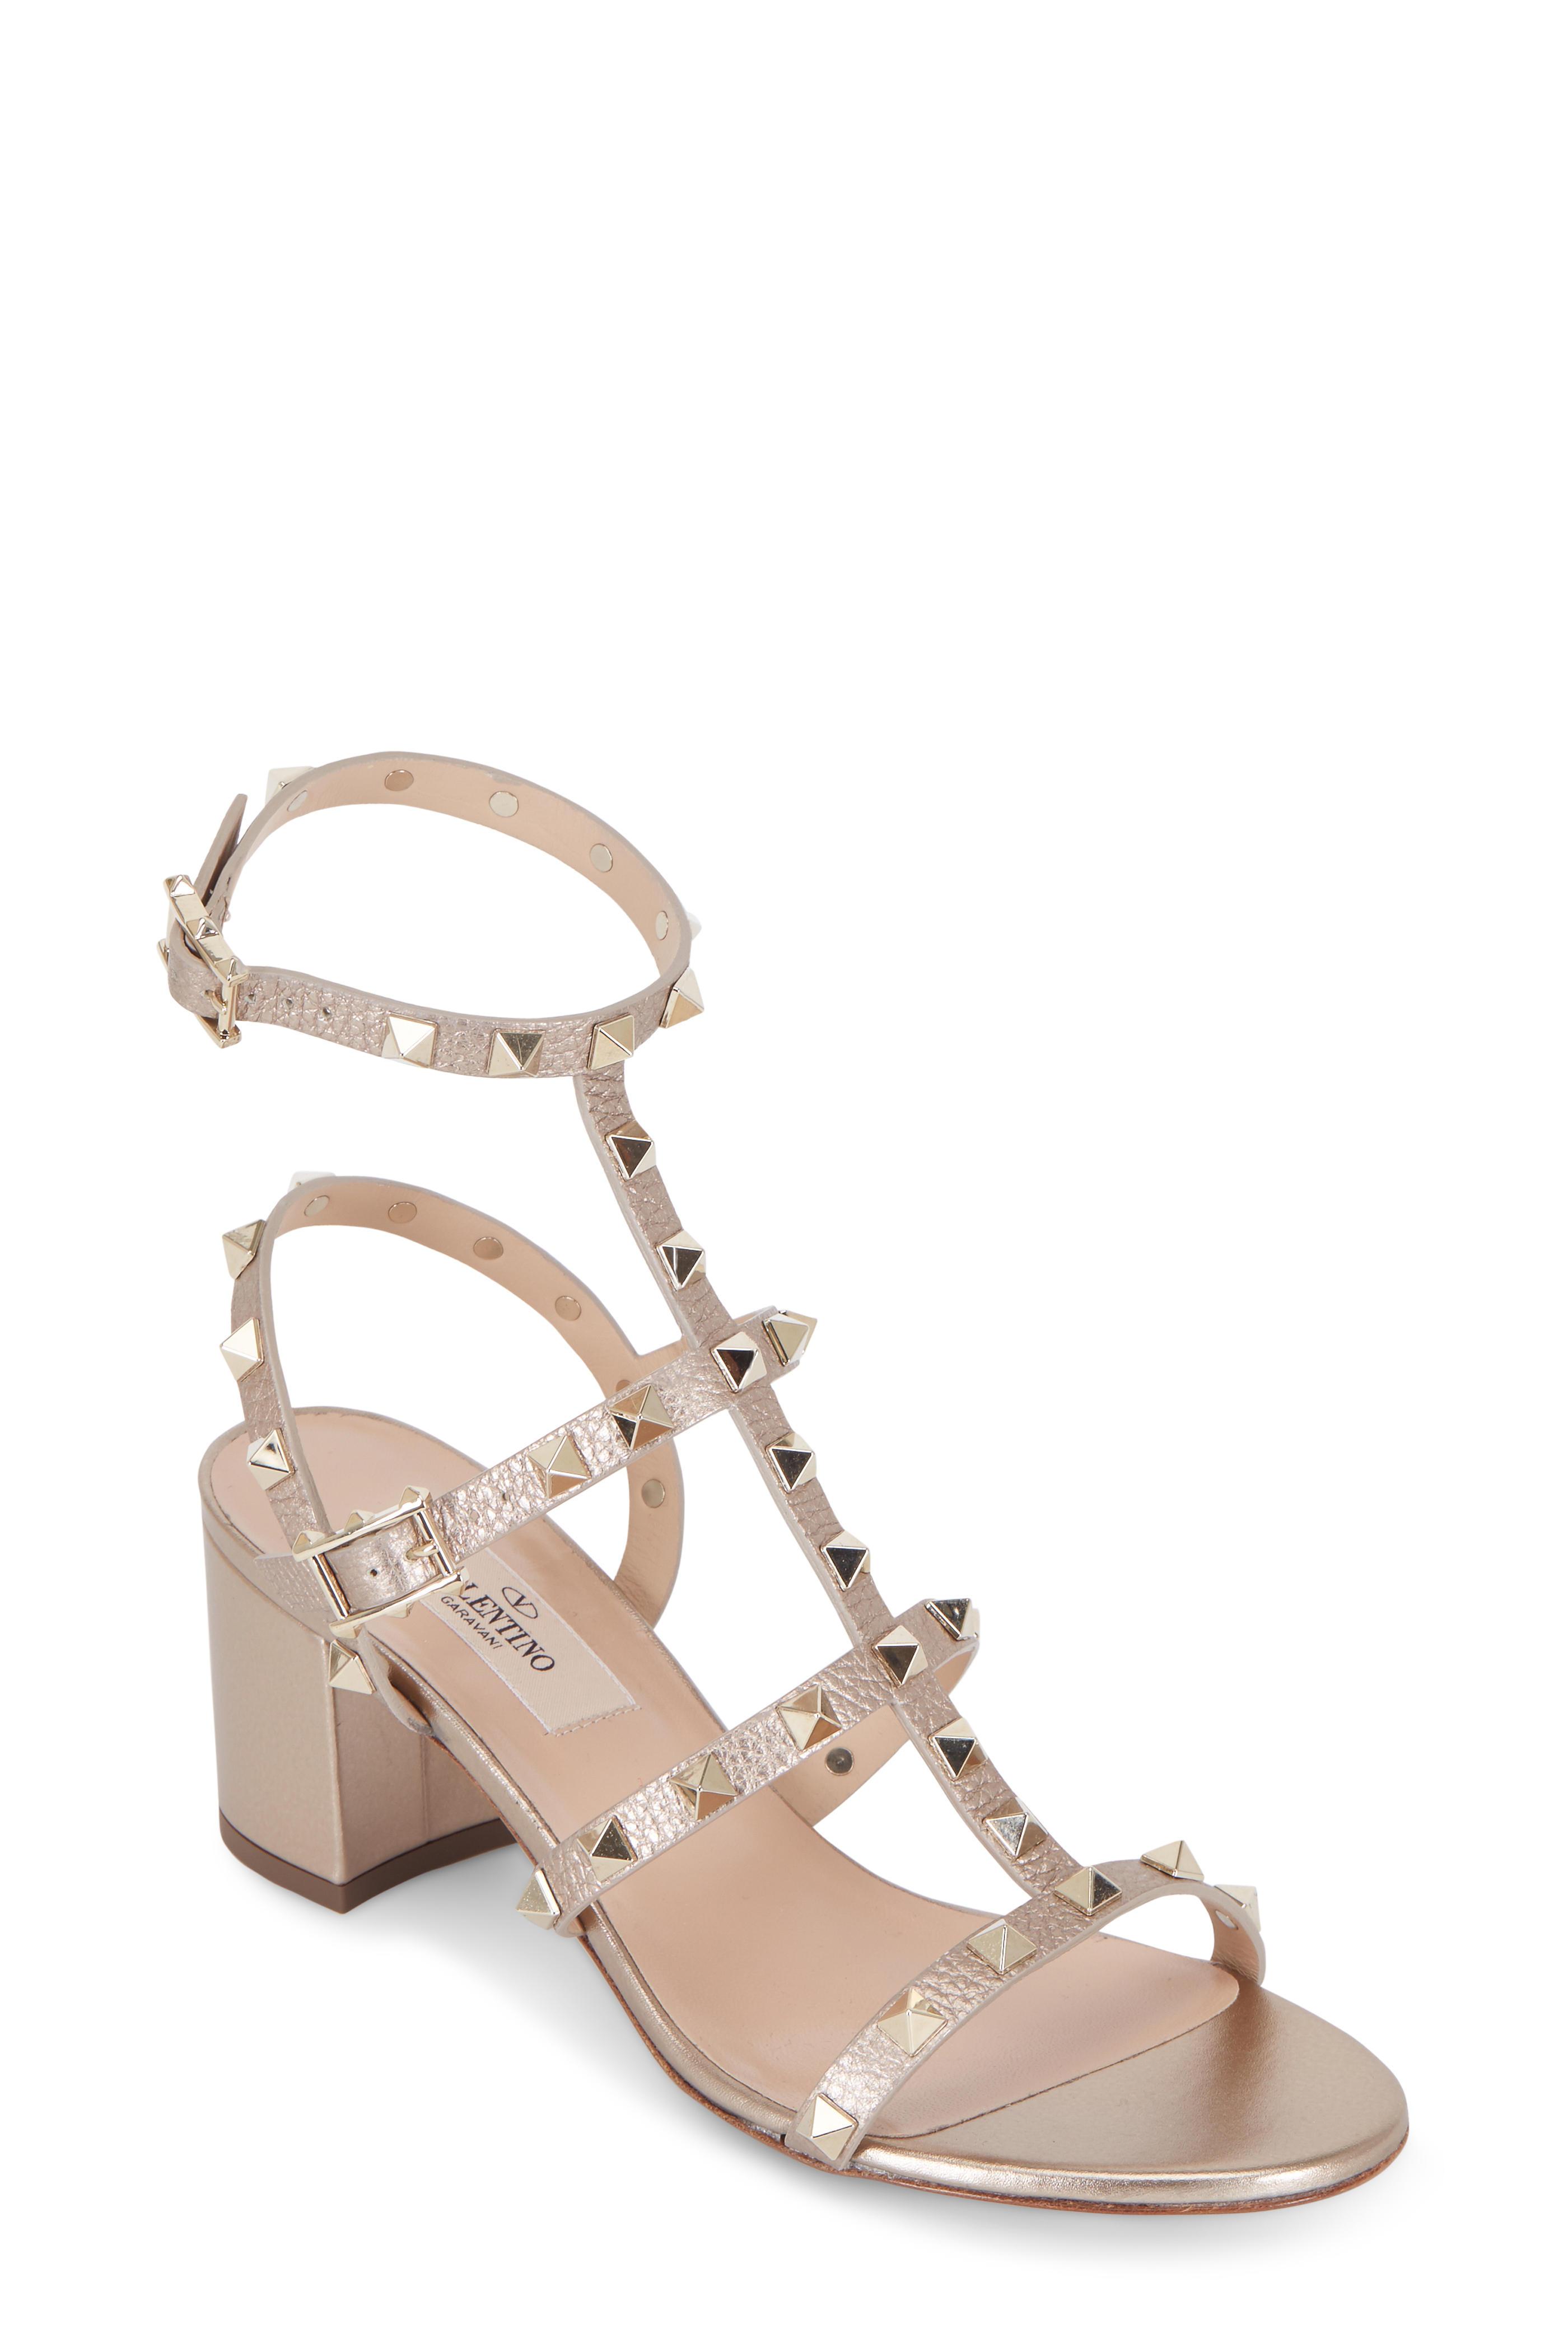 9e329e633eef Valentino Garavani - Rockstud Light Gold Leather City Sandal